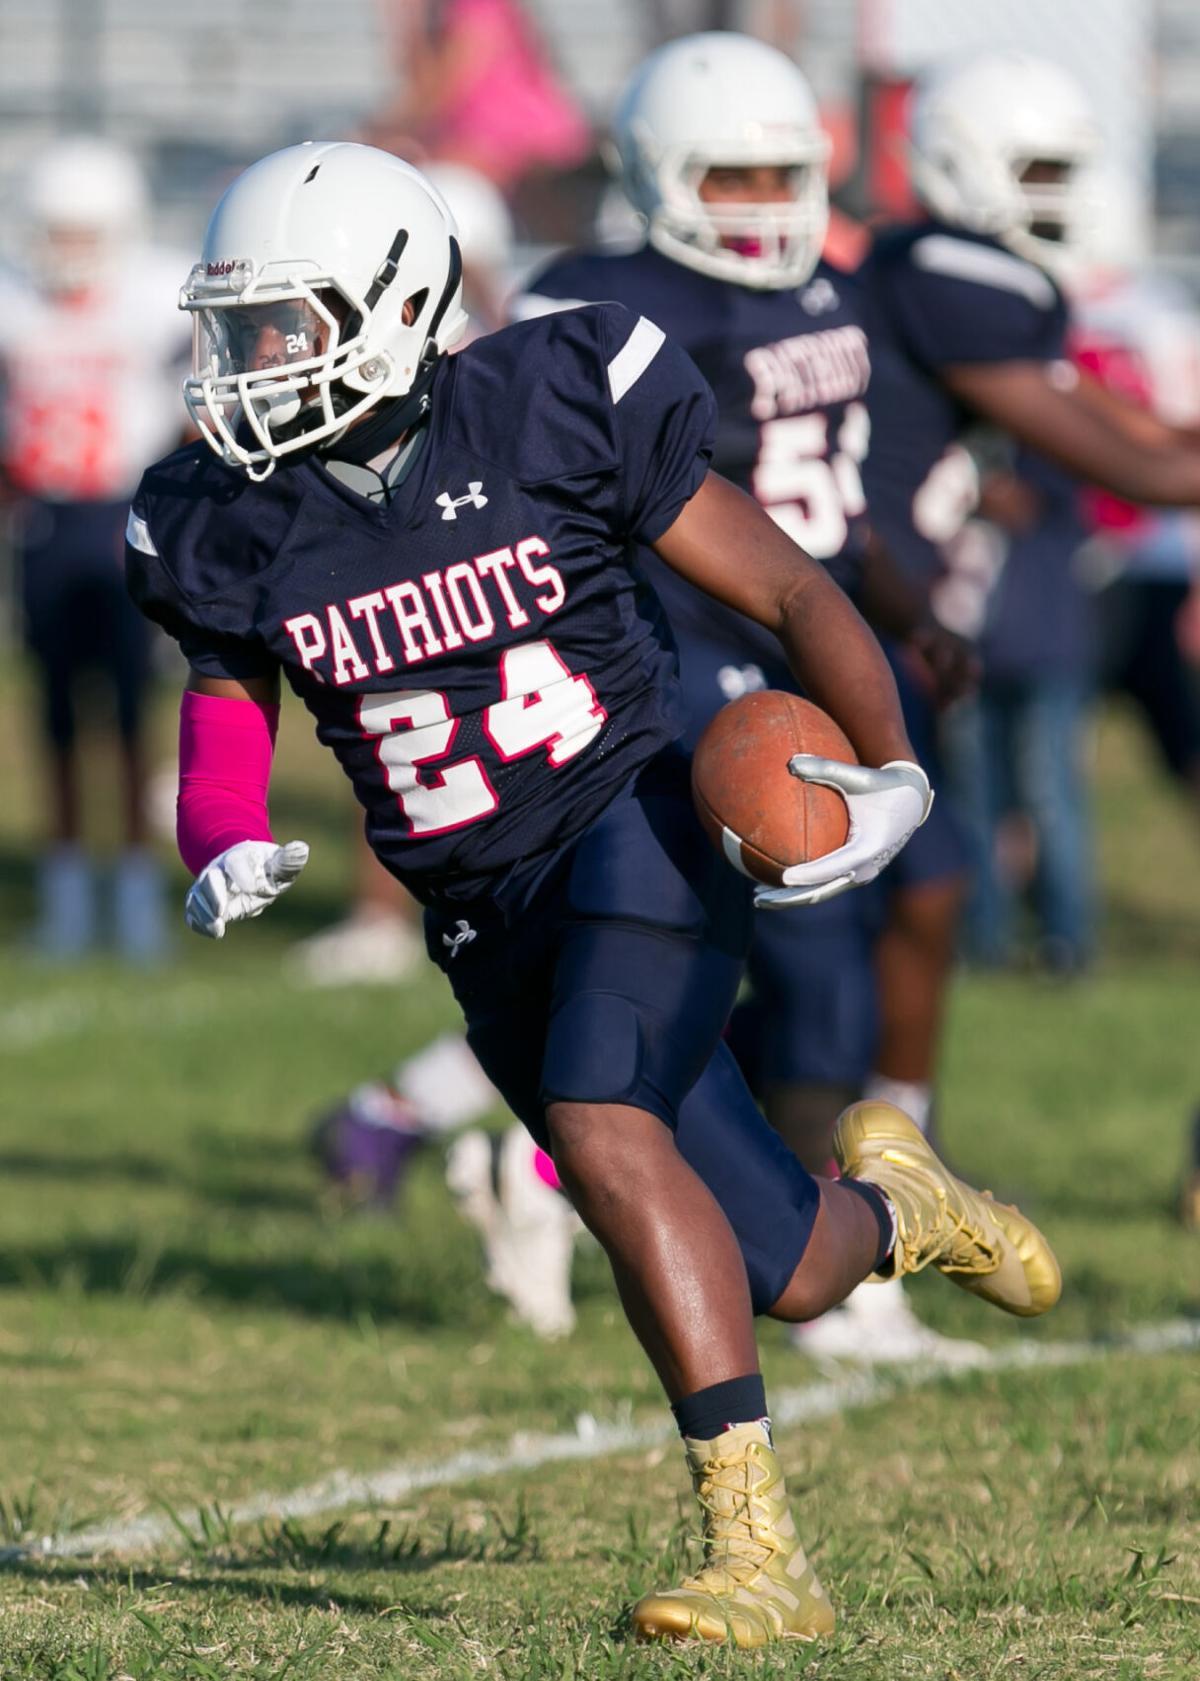 Patterson MS at Palo Alto 8th Grade Football